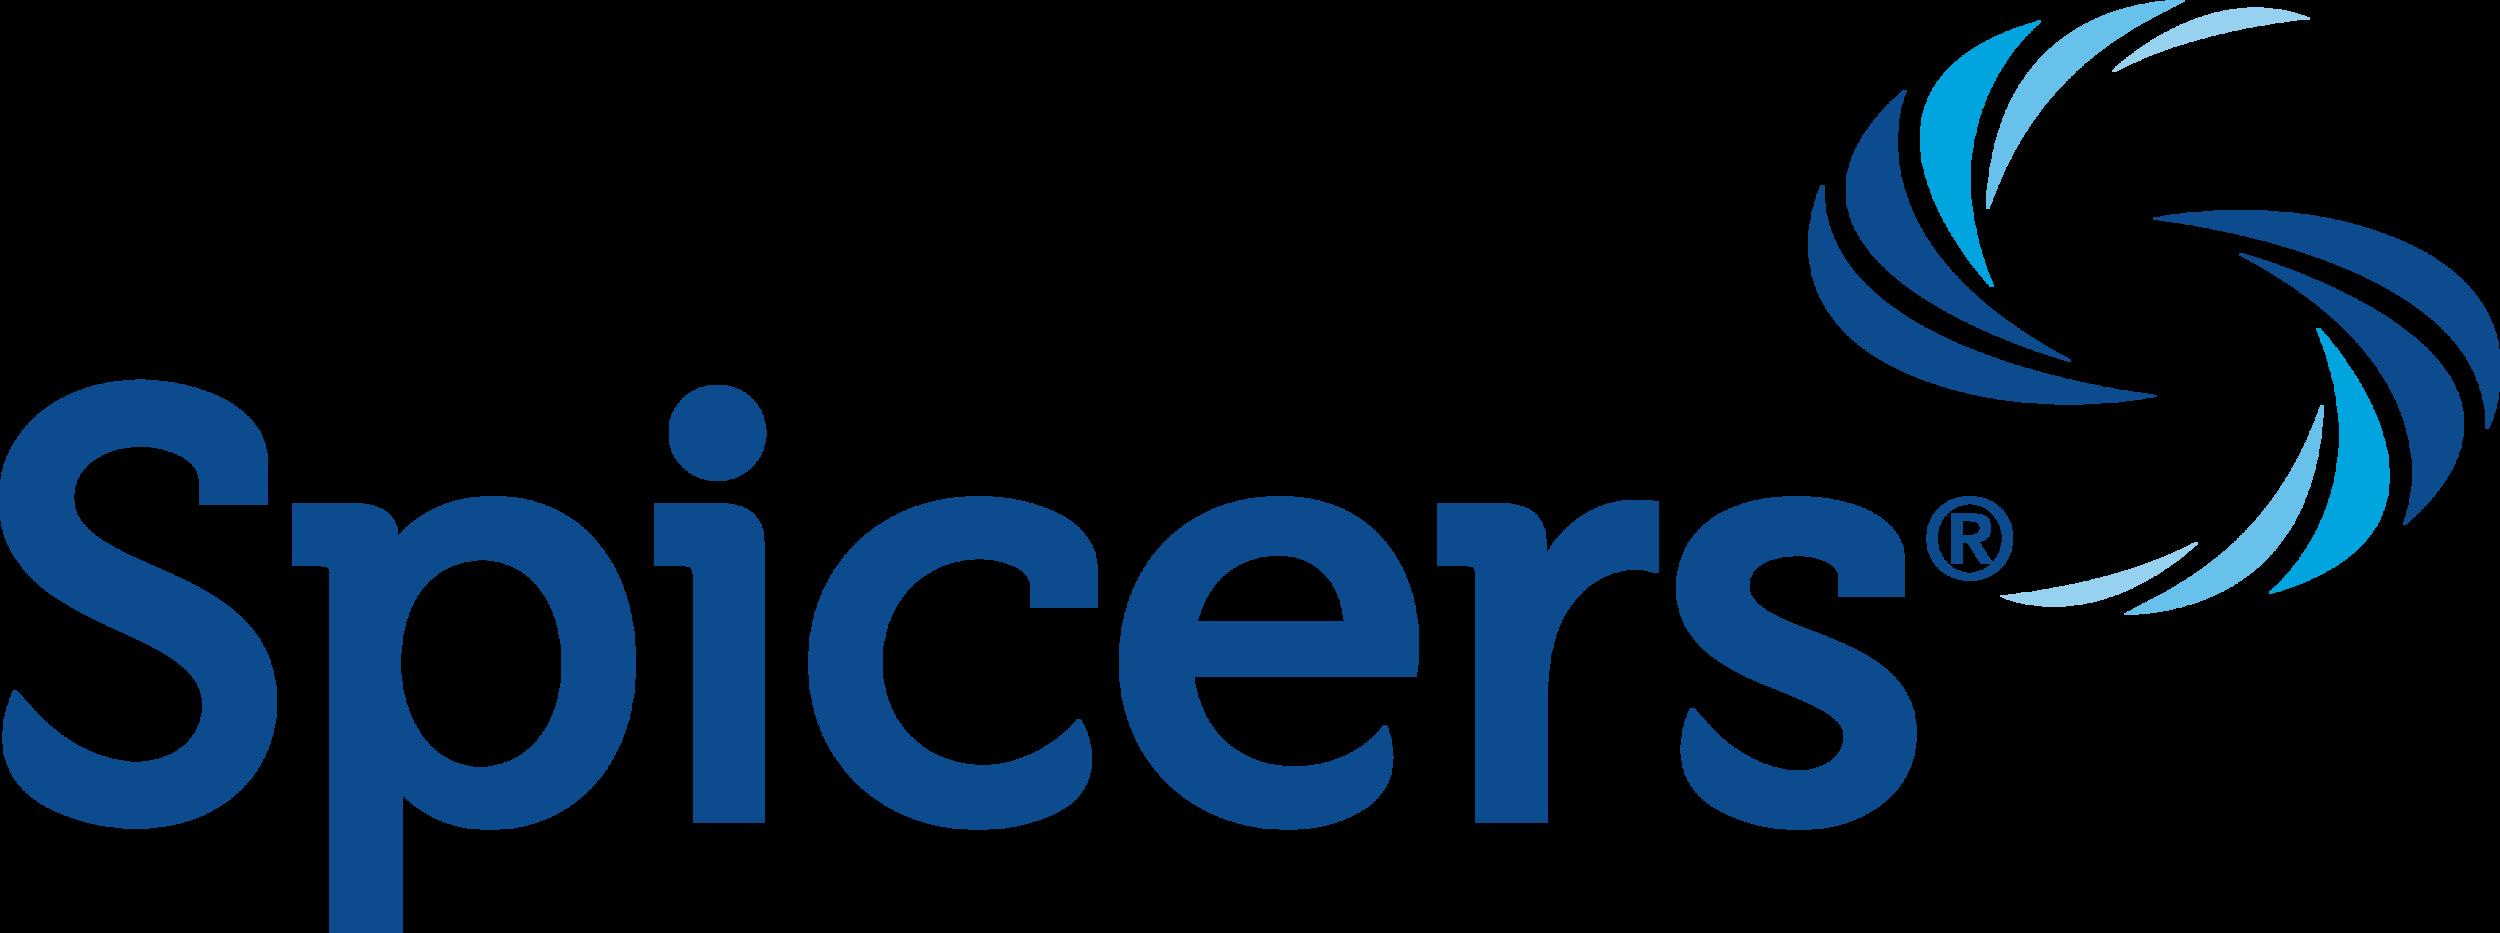 Spicers logo.png